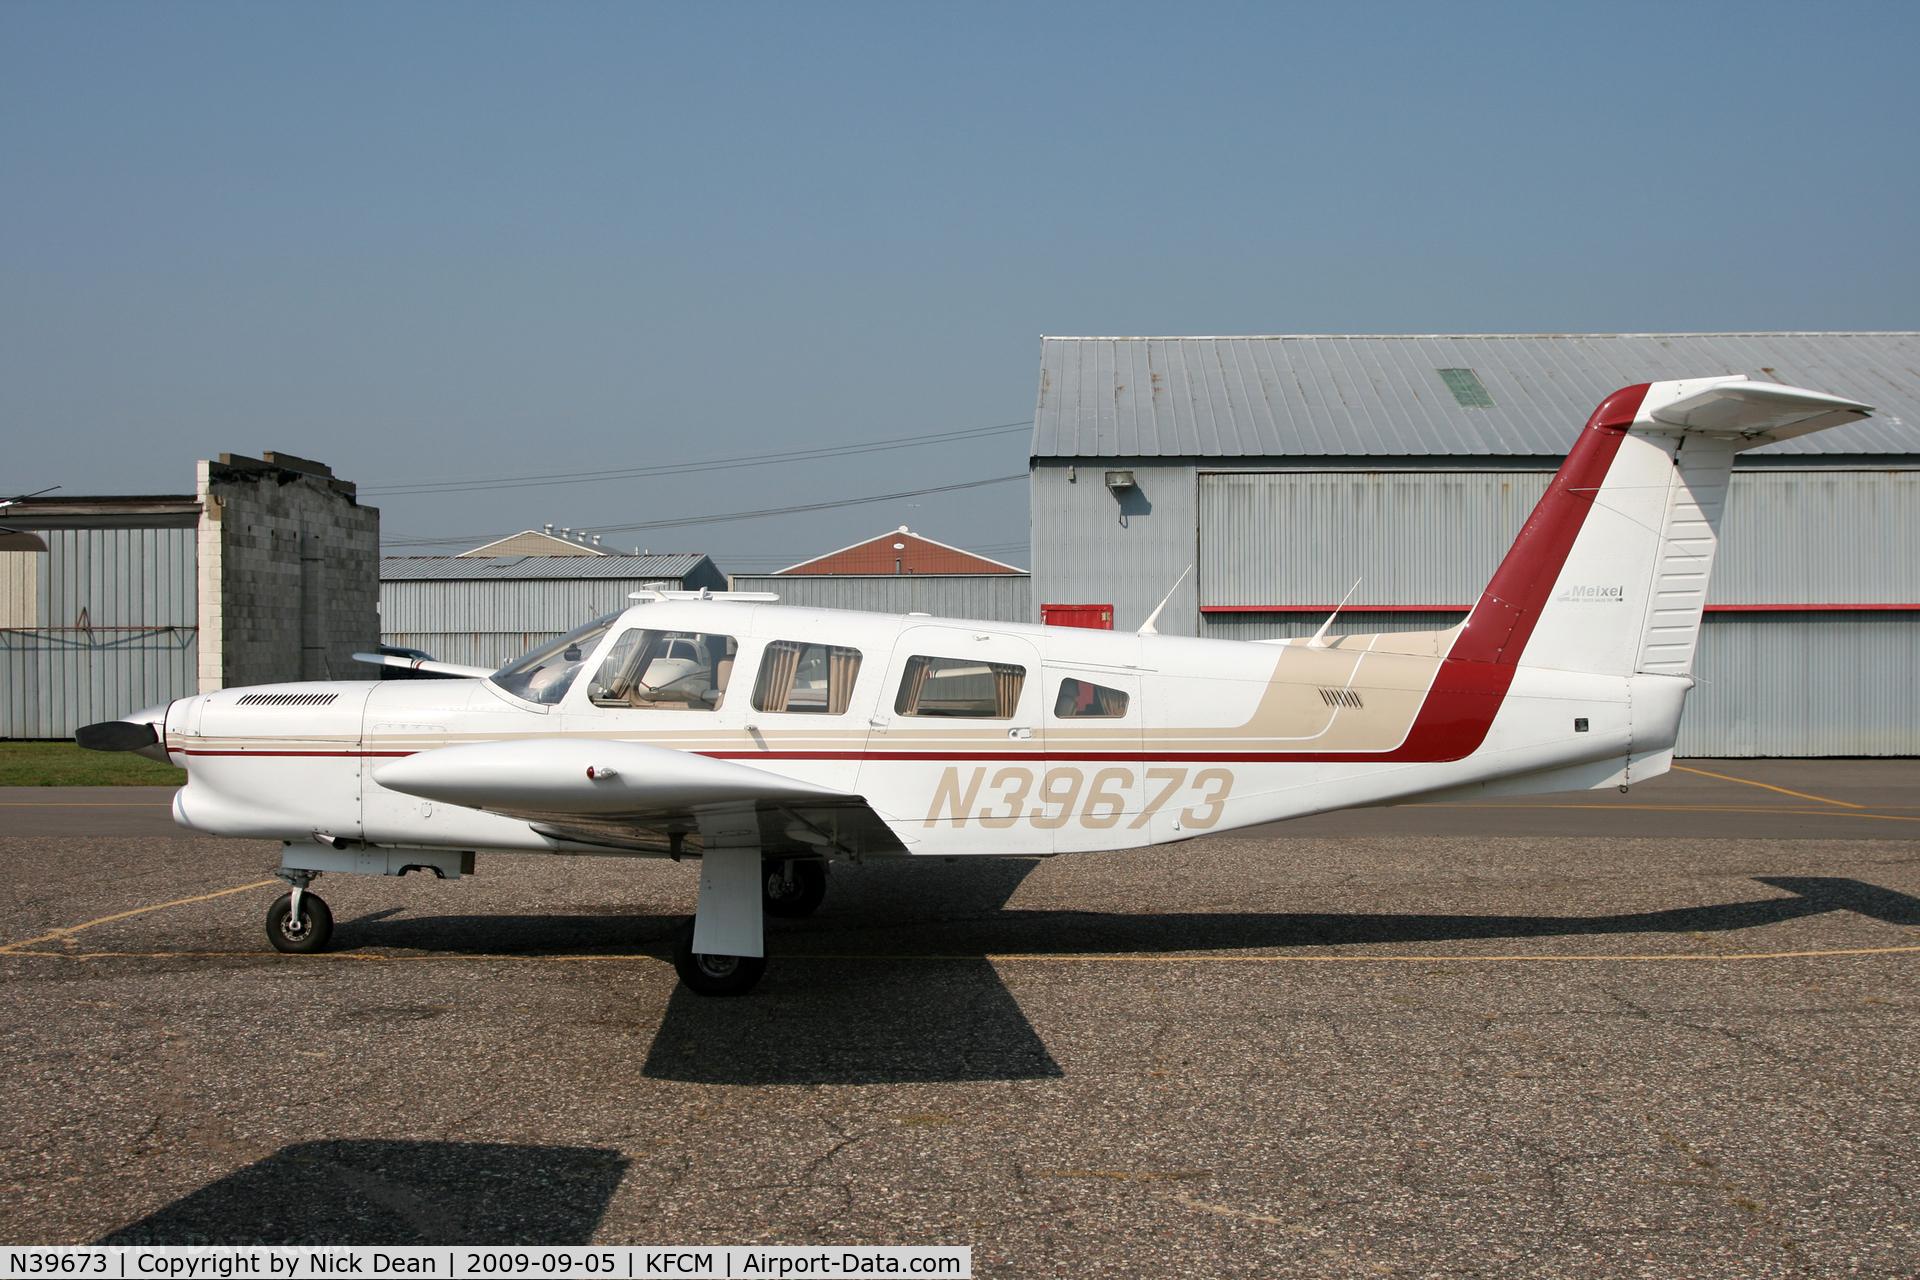 N39673, 1978 Piper PA-32RT-300T Turbo Lance II C/N 32R-7887139, KFCM